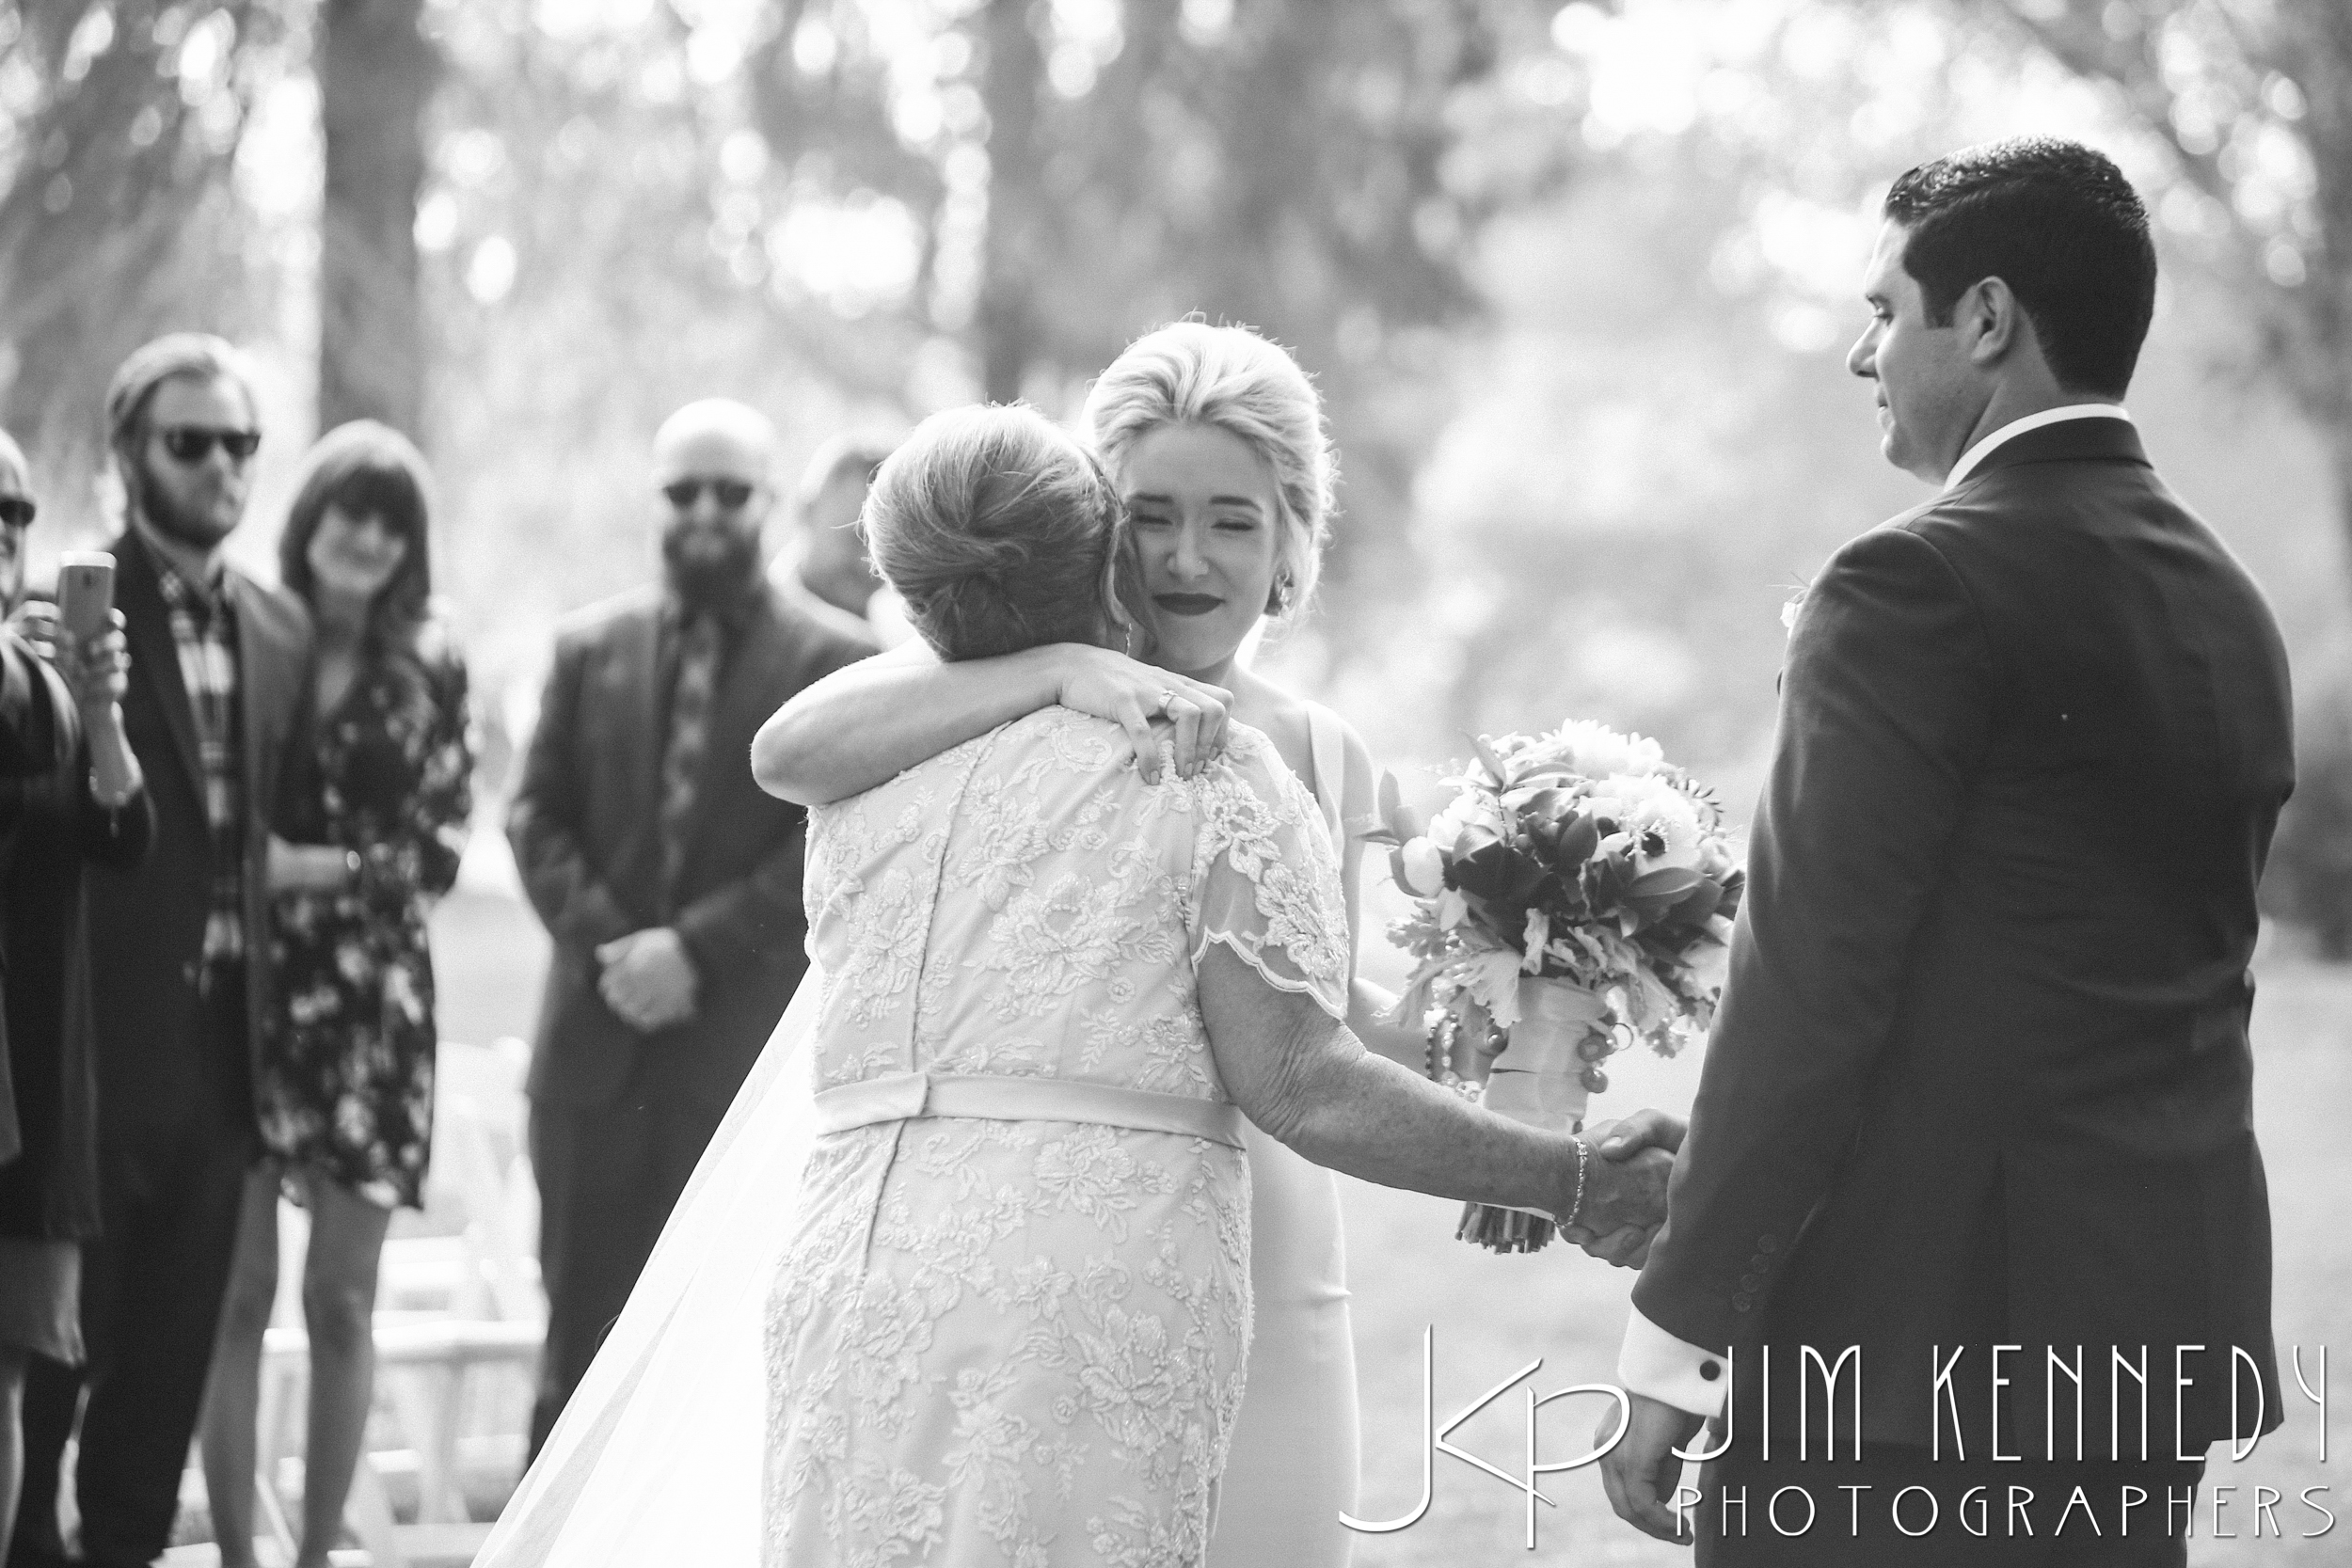 jim_kennedy_photographers_highland_springs_wedding_caitlyn_0081.jpg